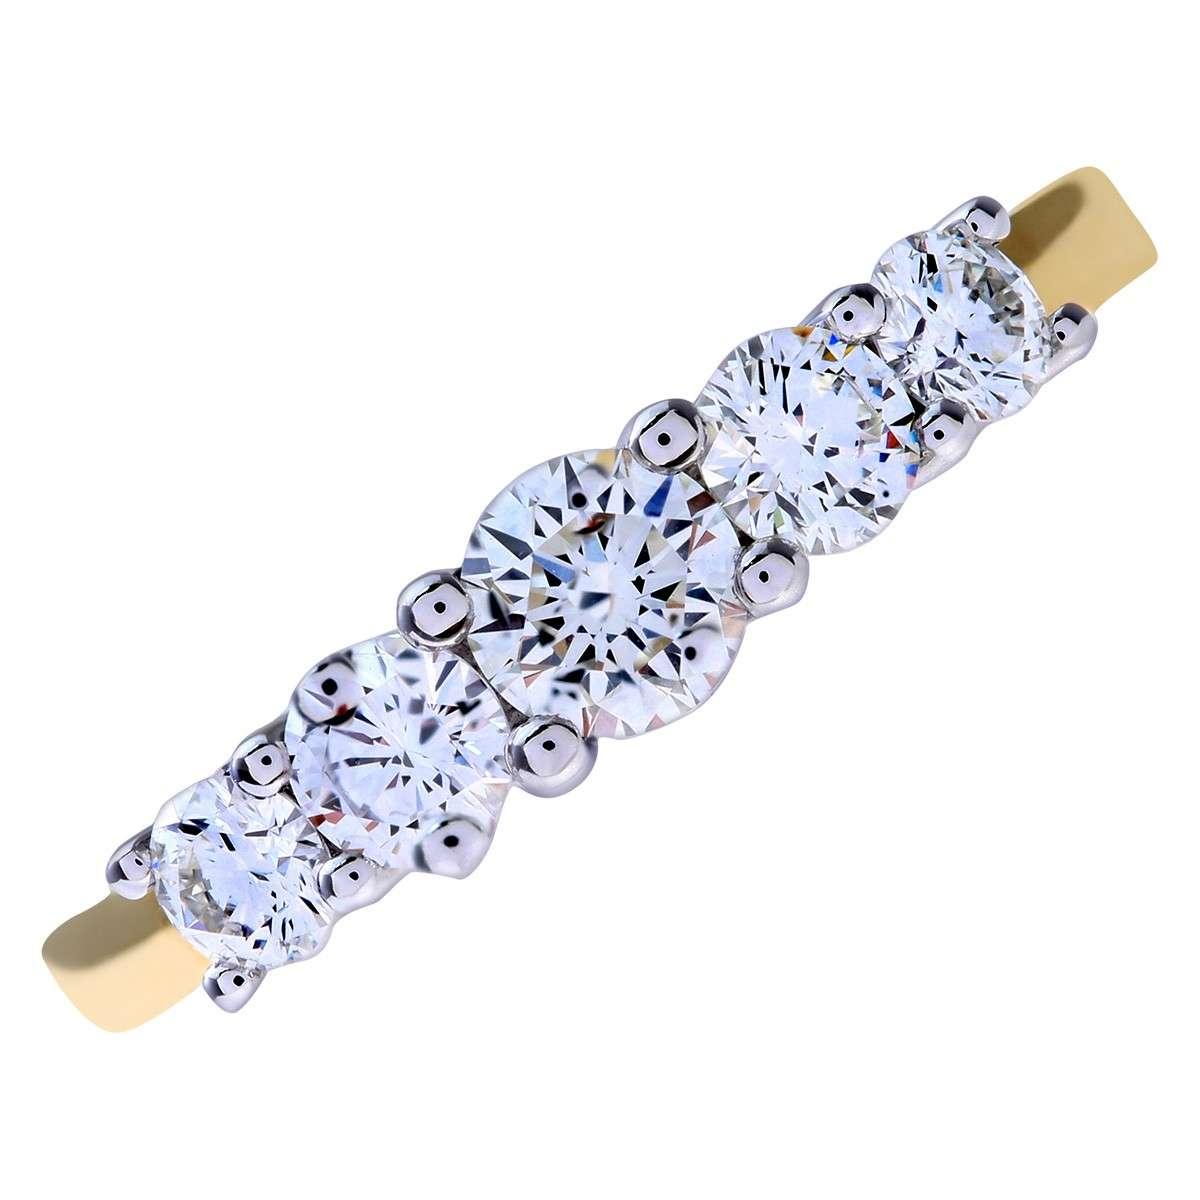 18CT YELLOW GOLD 0.75CT DIAMOND 5 STONE GRADUATE ETERNITY RING